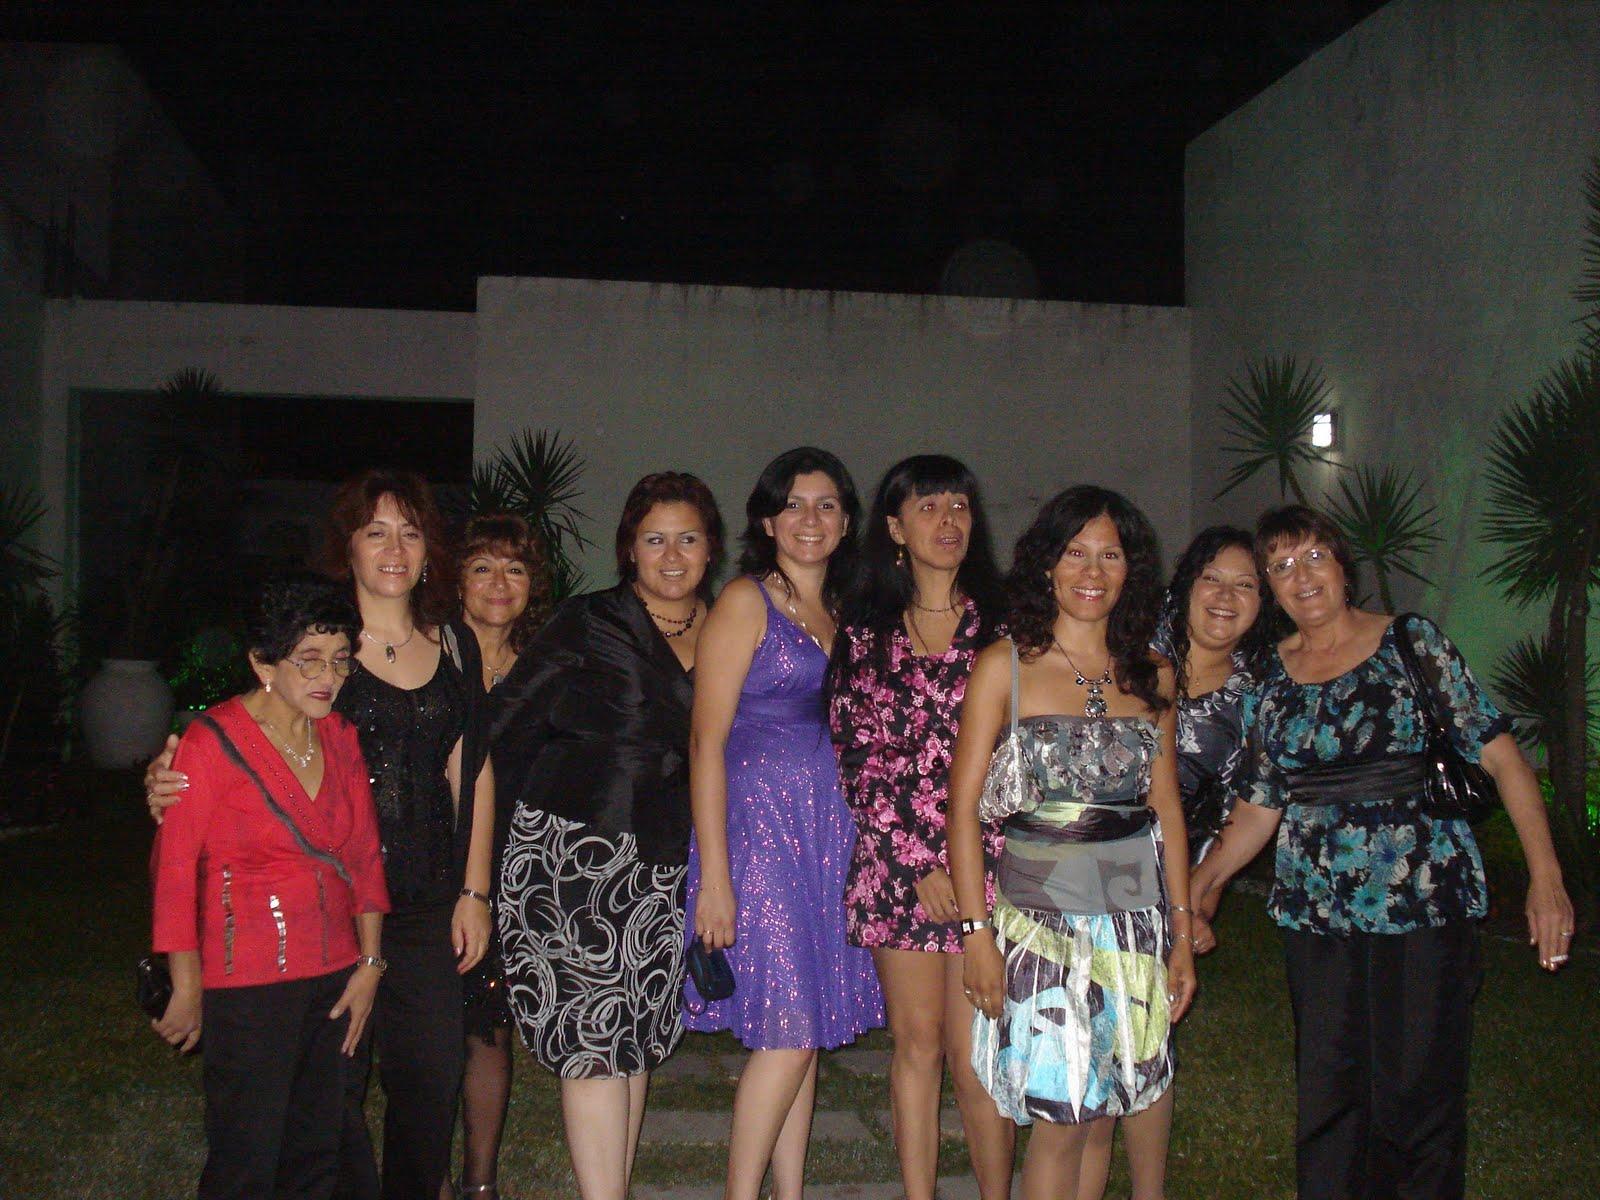 http://2.bp.blogspot.com/_VpZOTAYRbTA/S9oapnxf16I/AAAAAAAAAPQ/Y7Tk5tYTDfM/s1600/Cena+Aniversario+3.JPG